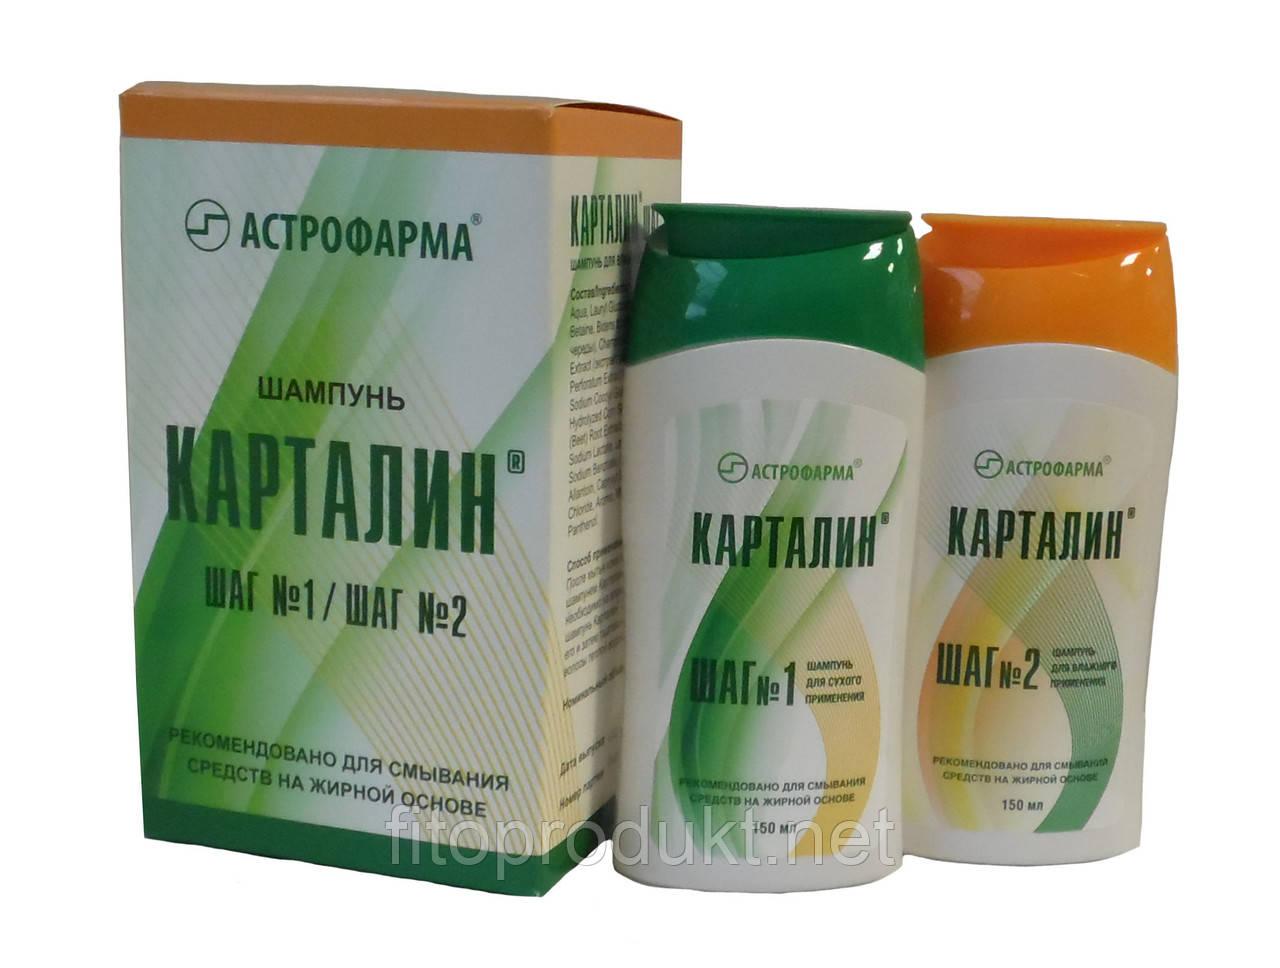 Шампунь Карталин® Шаг №1 и Шаг №2 - 2 флакона по 150 мл Астрофарма